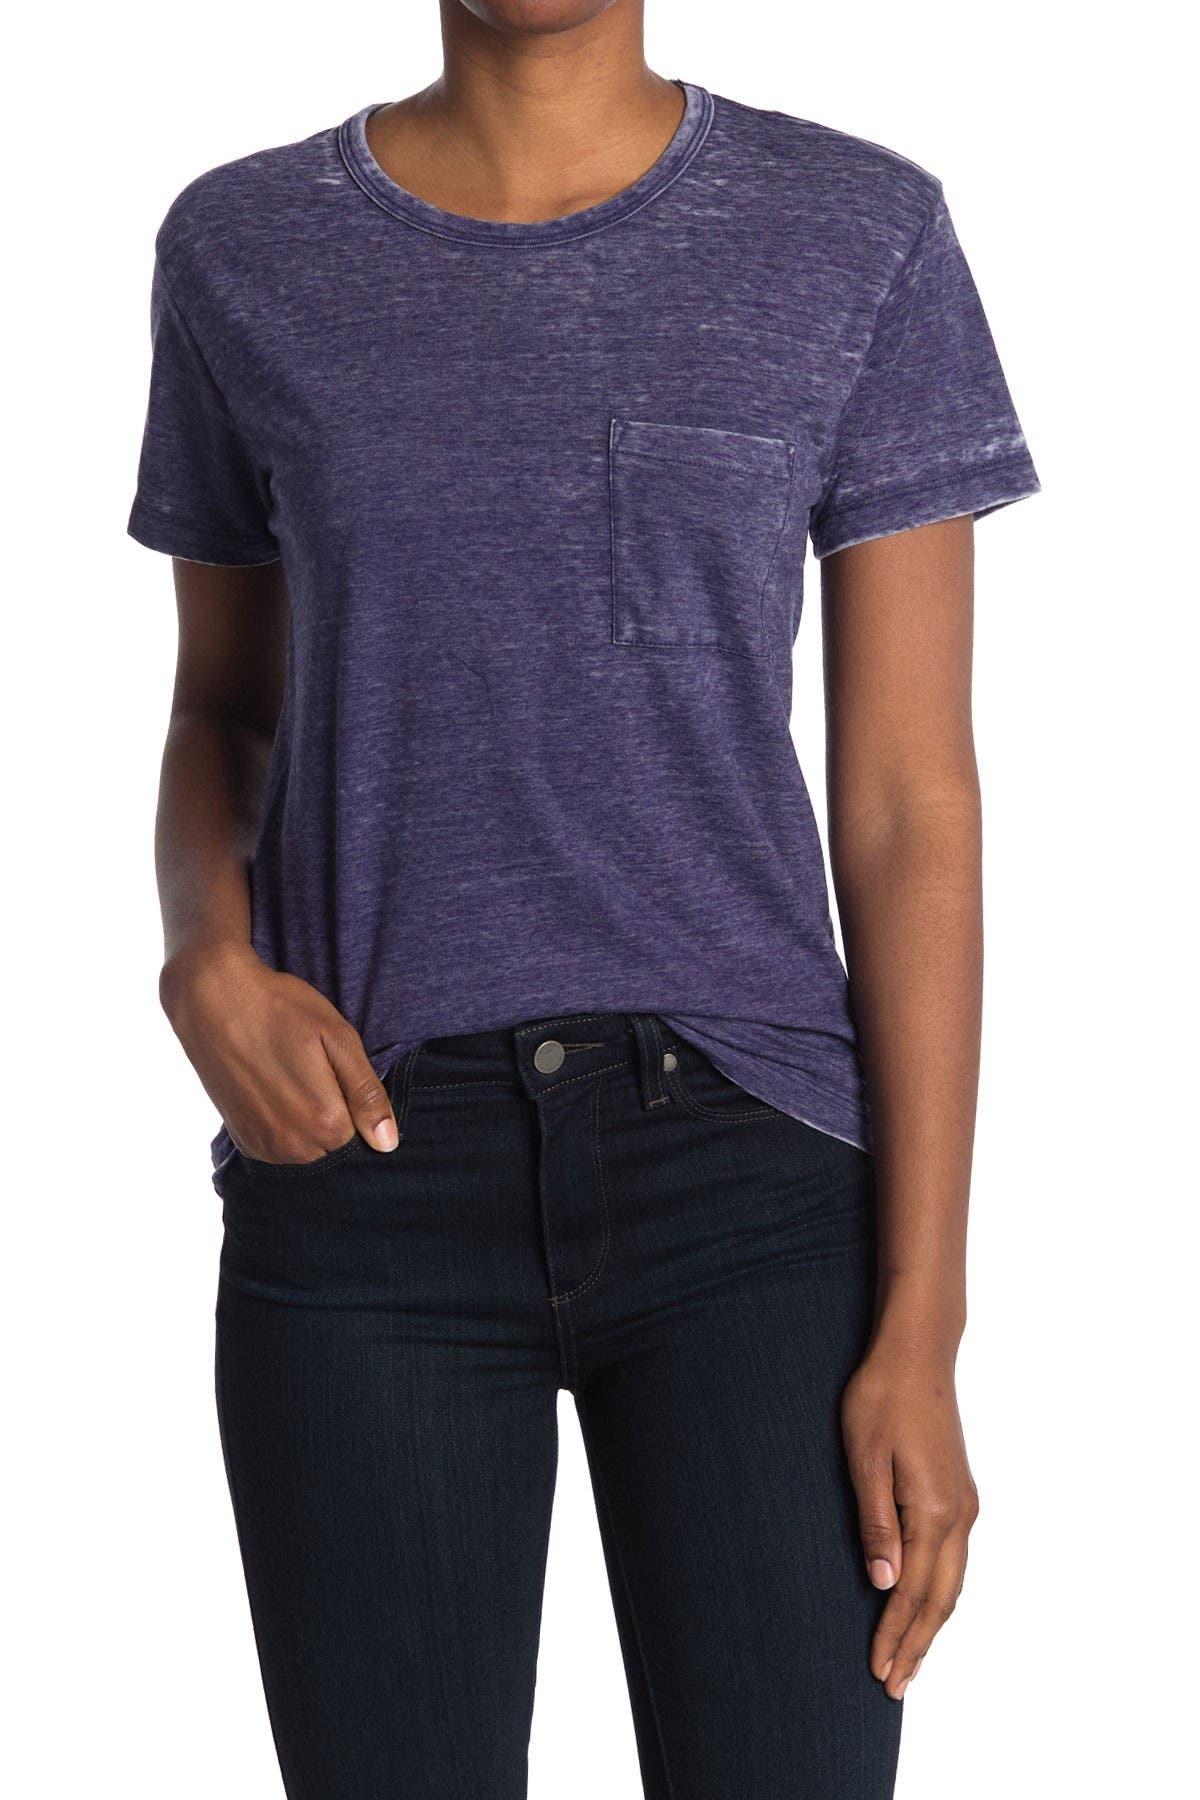 Image of J. Crew Burnout Pocket Crew Neck T-Shirt